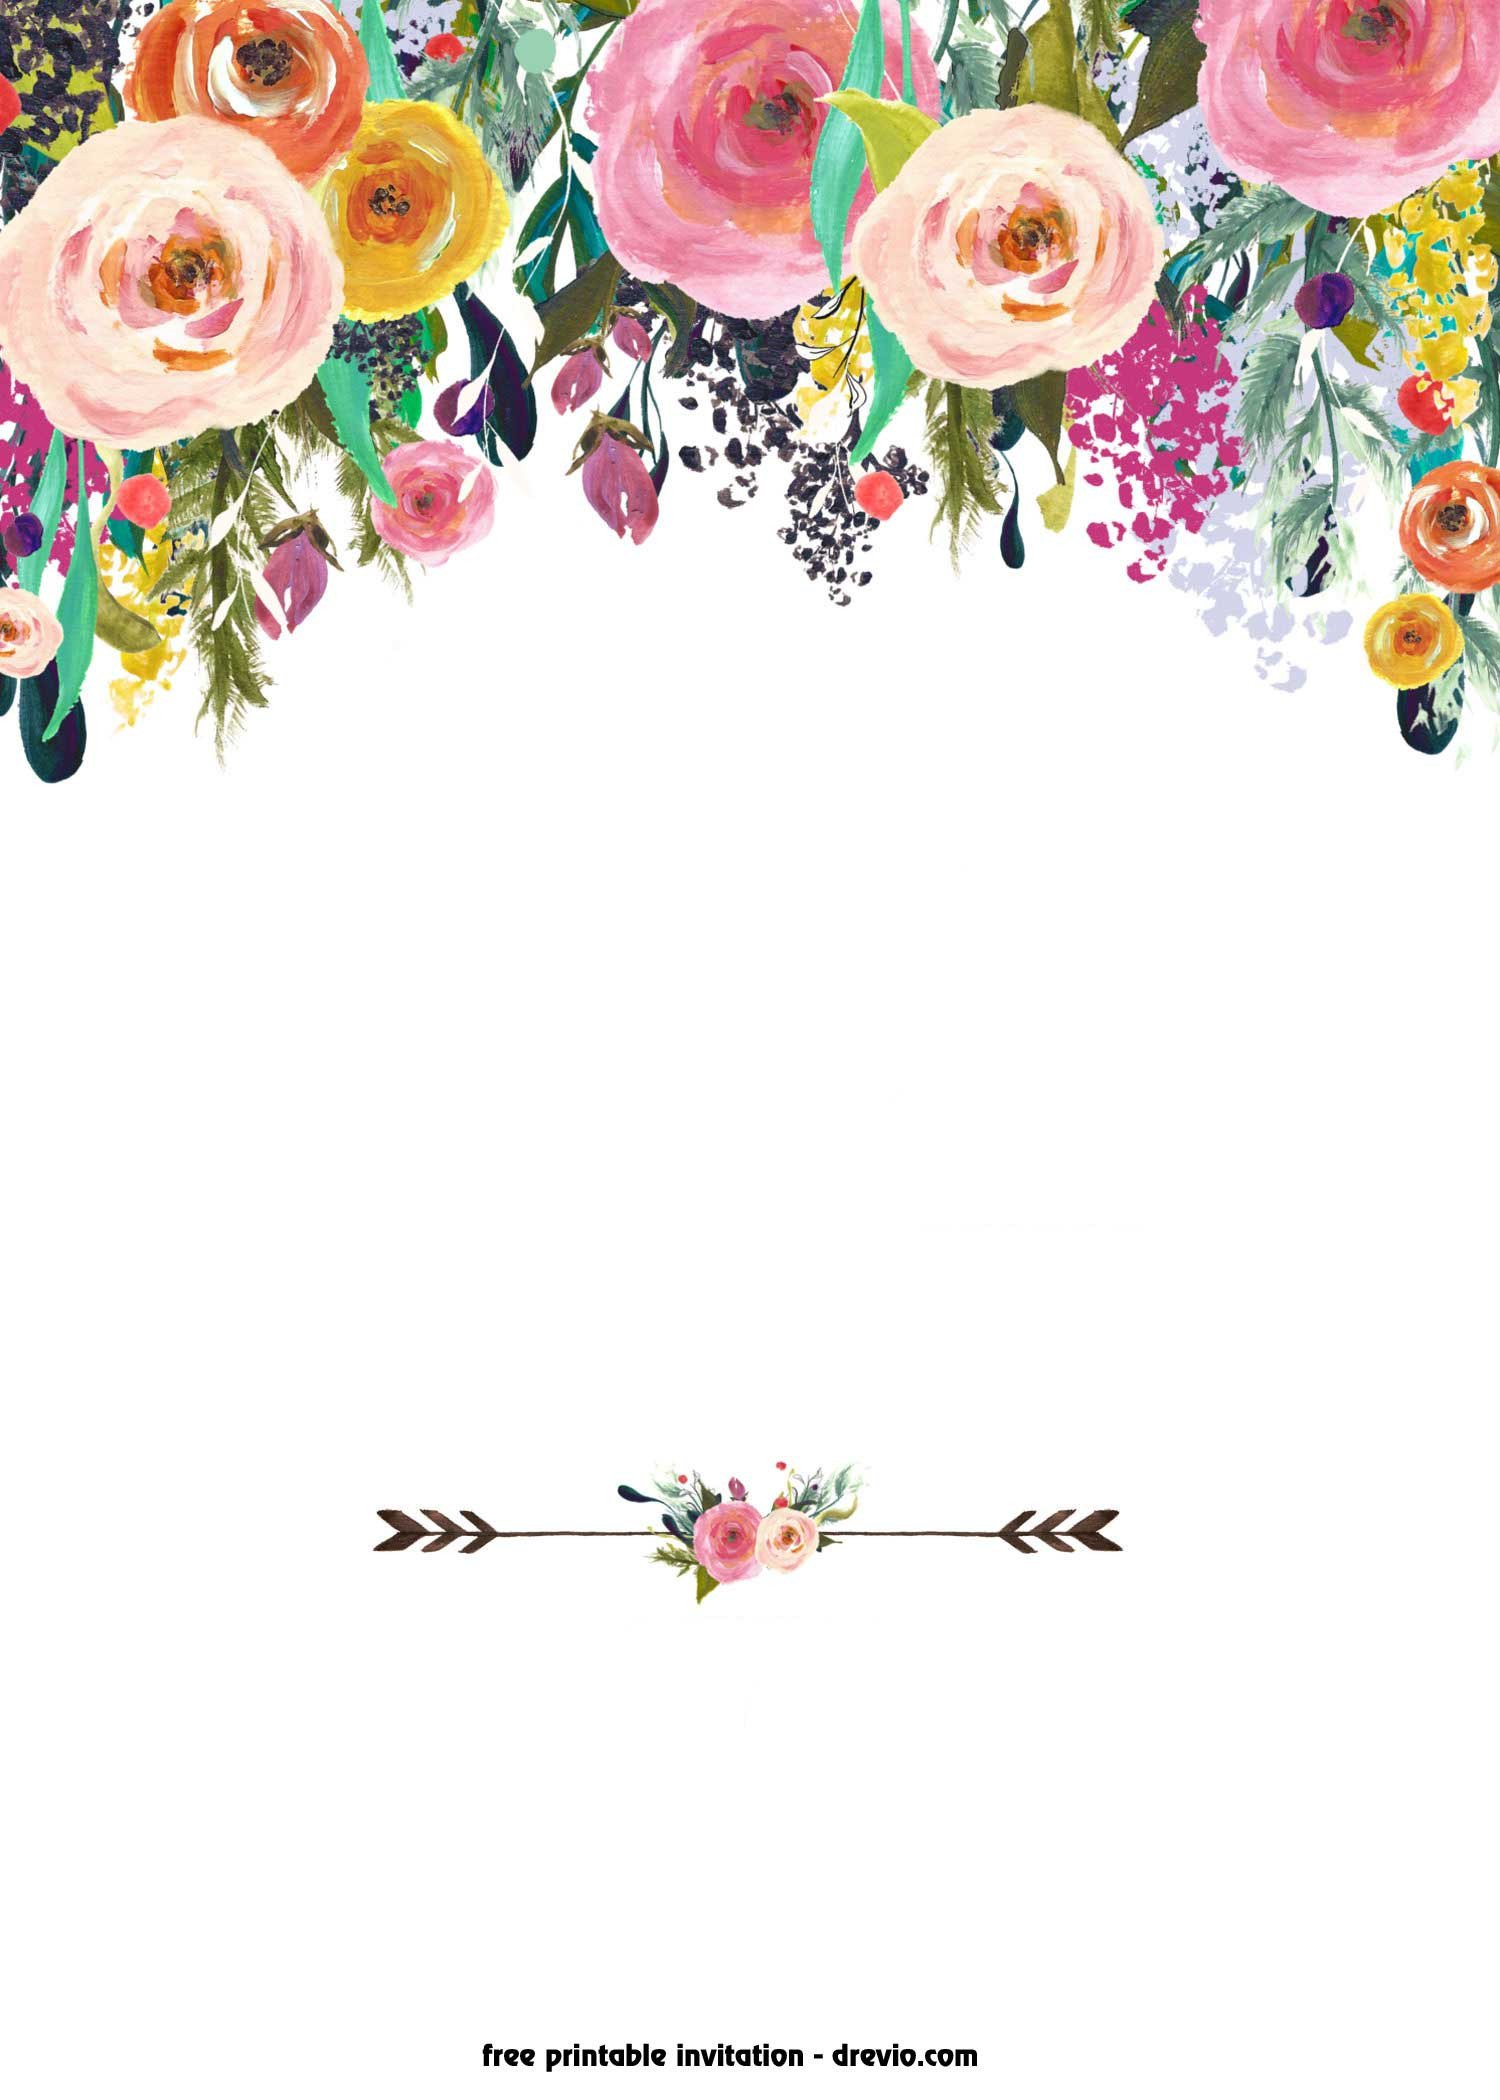 Free Shower Invitation Template Free Printable Boho Chic Flower Baby Shower Invitation